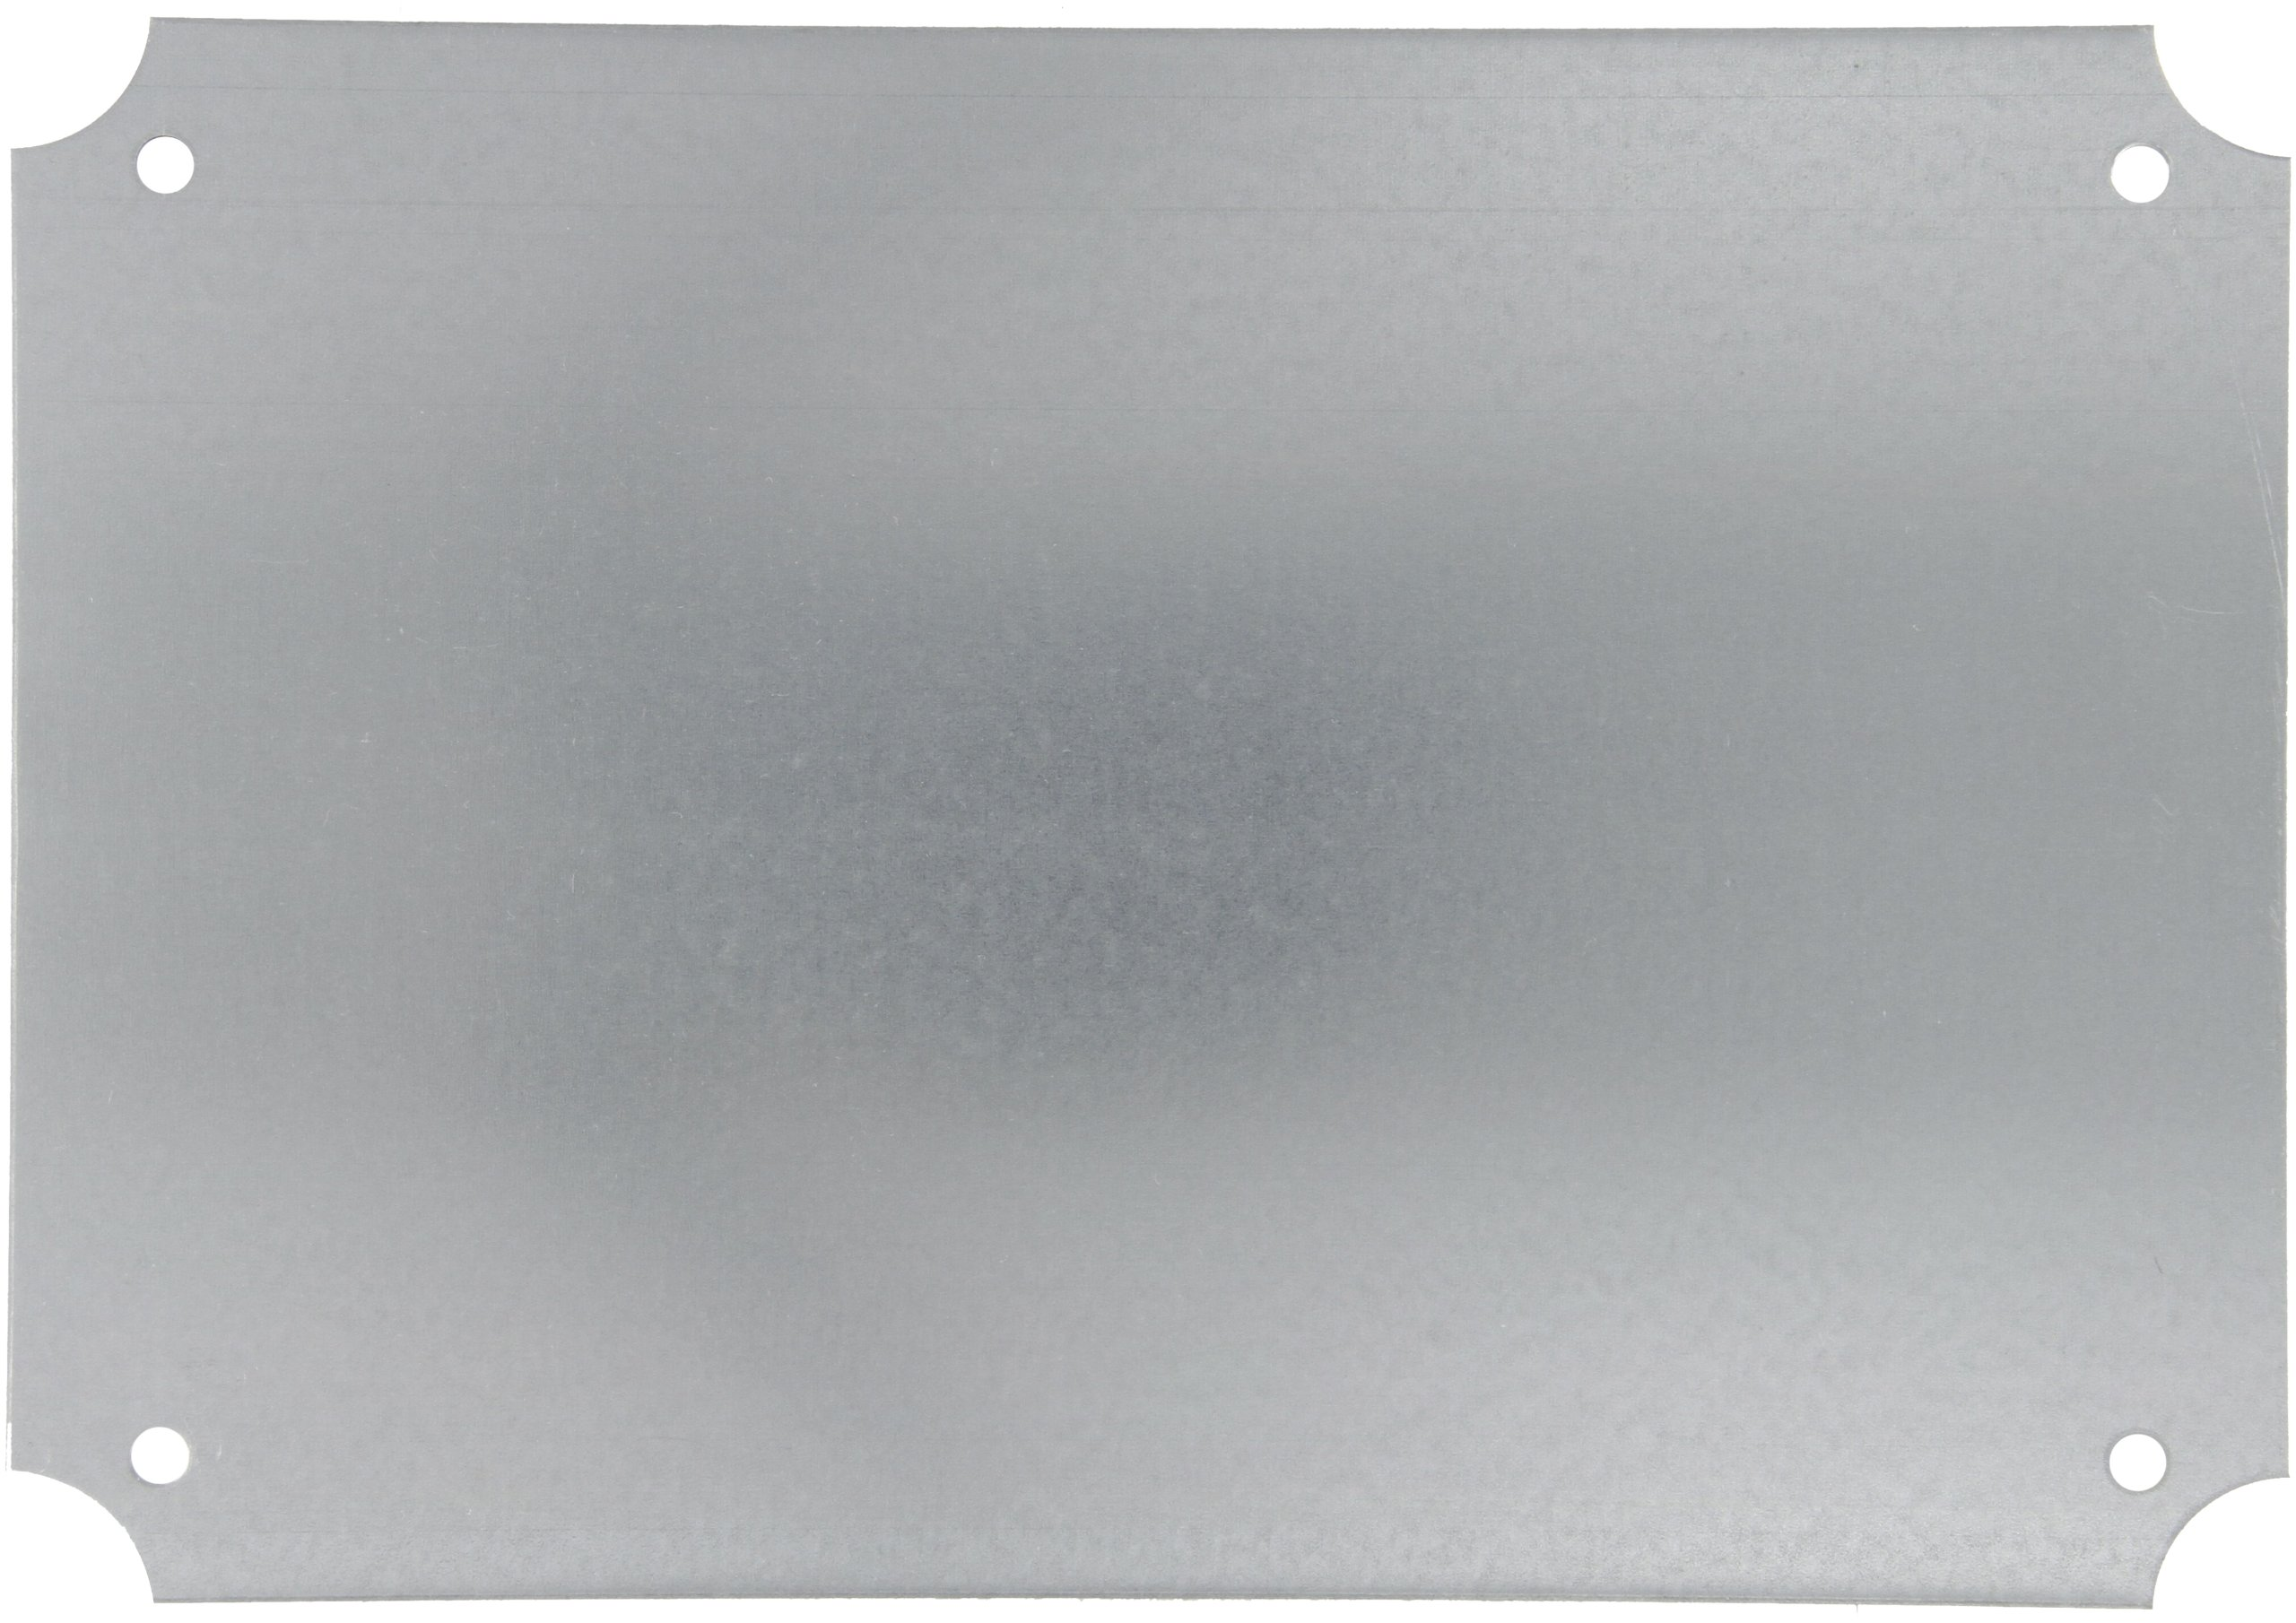 BUD Industries NBX-10988 Steel Internal Panel, 12-63/64'' Length x 19-3/64'' Width x 1/16'' Thick, for NEMA Box